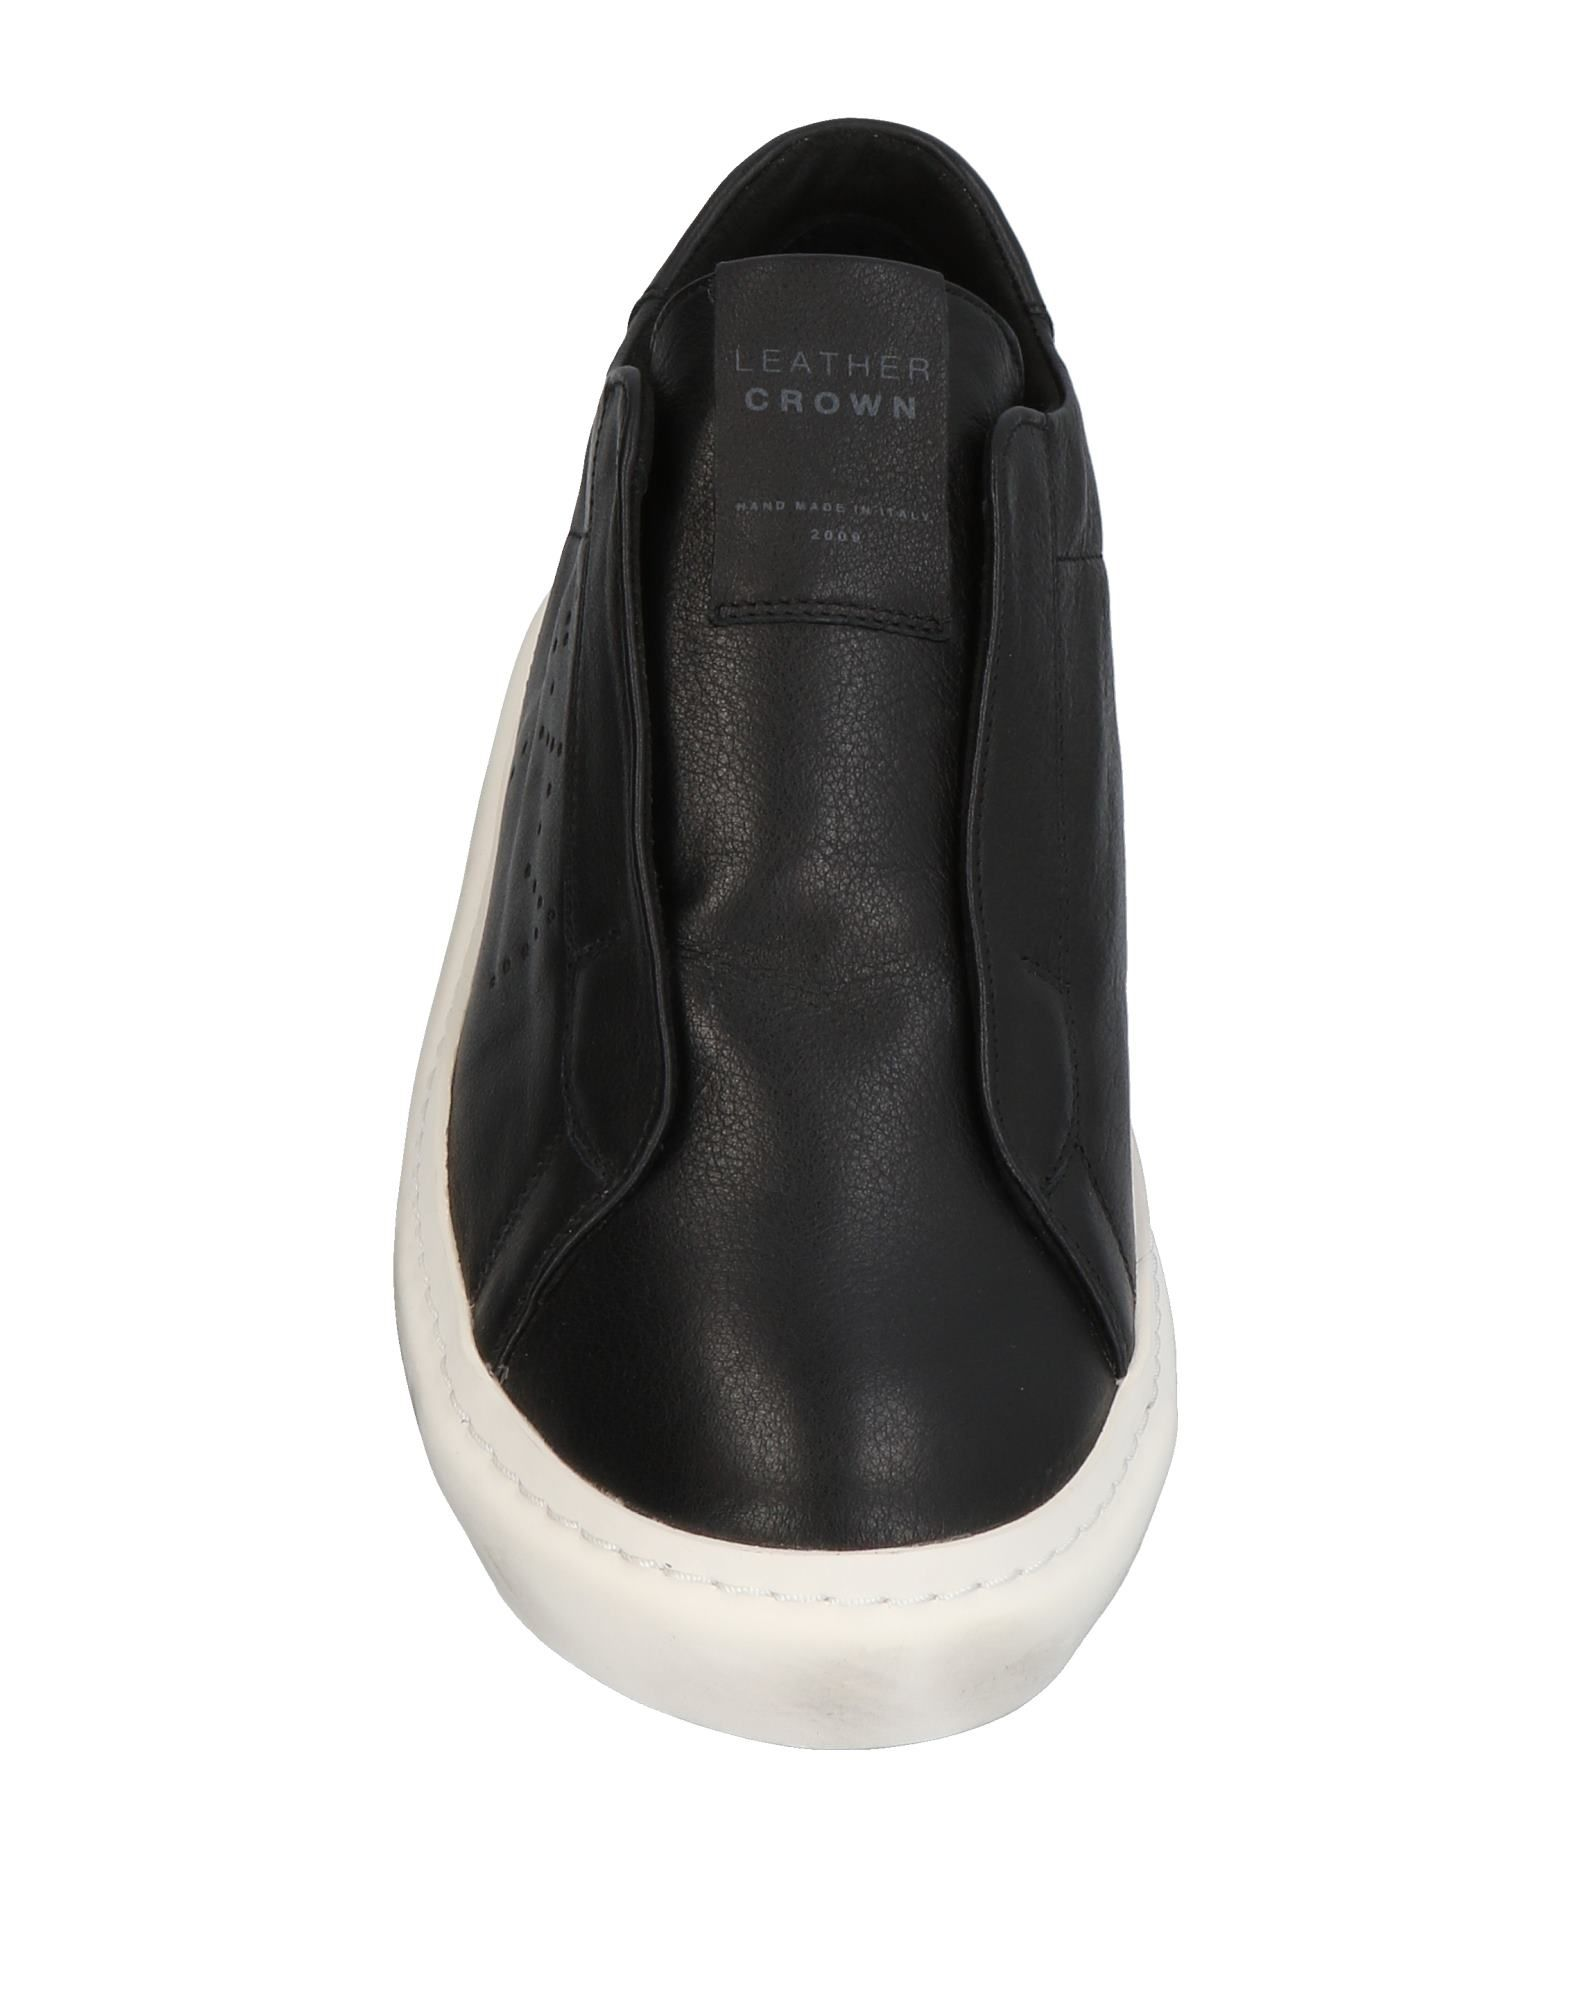 Leder Crown Sneakers Herren Gutes 10580 Preis-Leistungs-Verhältnis, es lohnt sich 10580 Gutes 0960f7